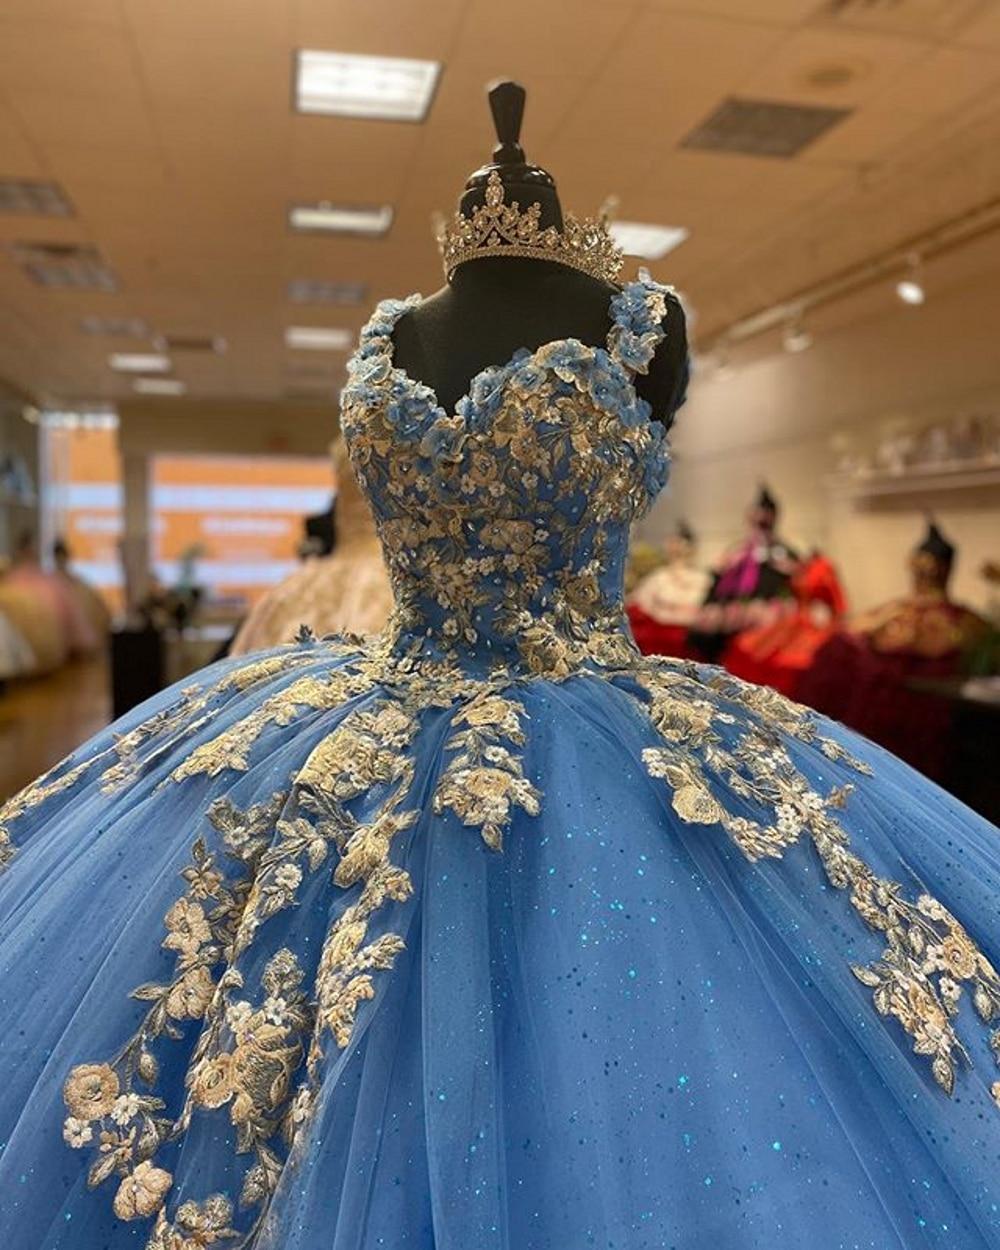 light blue quinceanera dress,sequined quinceanera dress,baby blue quinceanera dress,pretty puffy quinceanera dress,images quinceanera dress with flower fabric,quinceanera dress with straps,no ruffles quinceanera dress,2021 quinceanera dress,